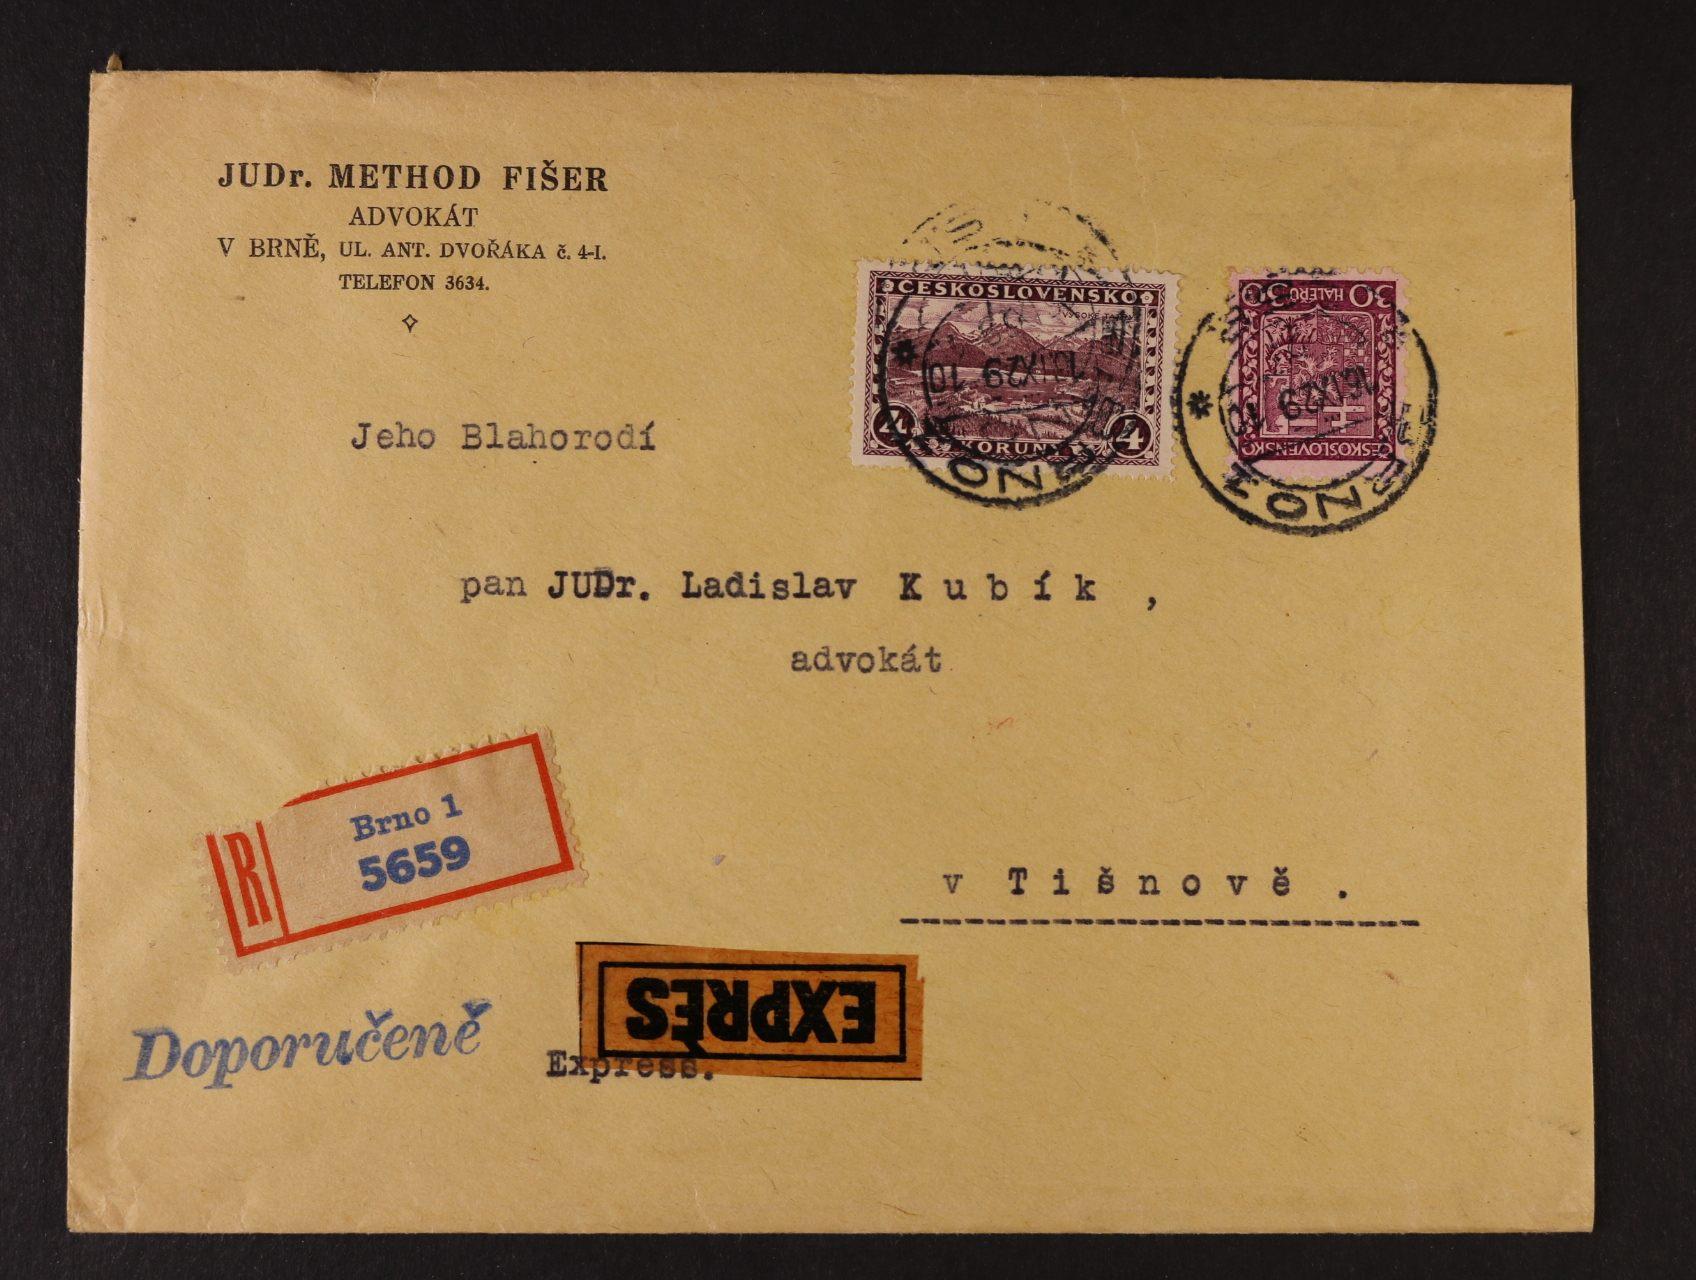 firemní R-EXPRES dopis frank.mj. zn. č. 227, pod. raz. BRNO 16.9.29